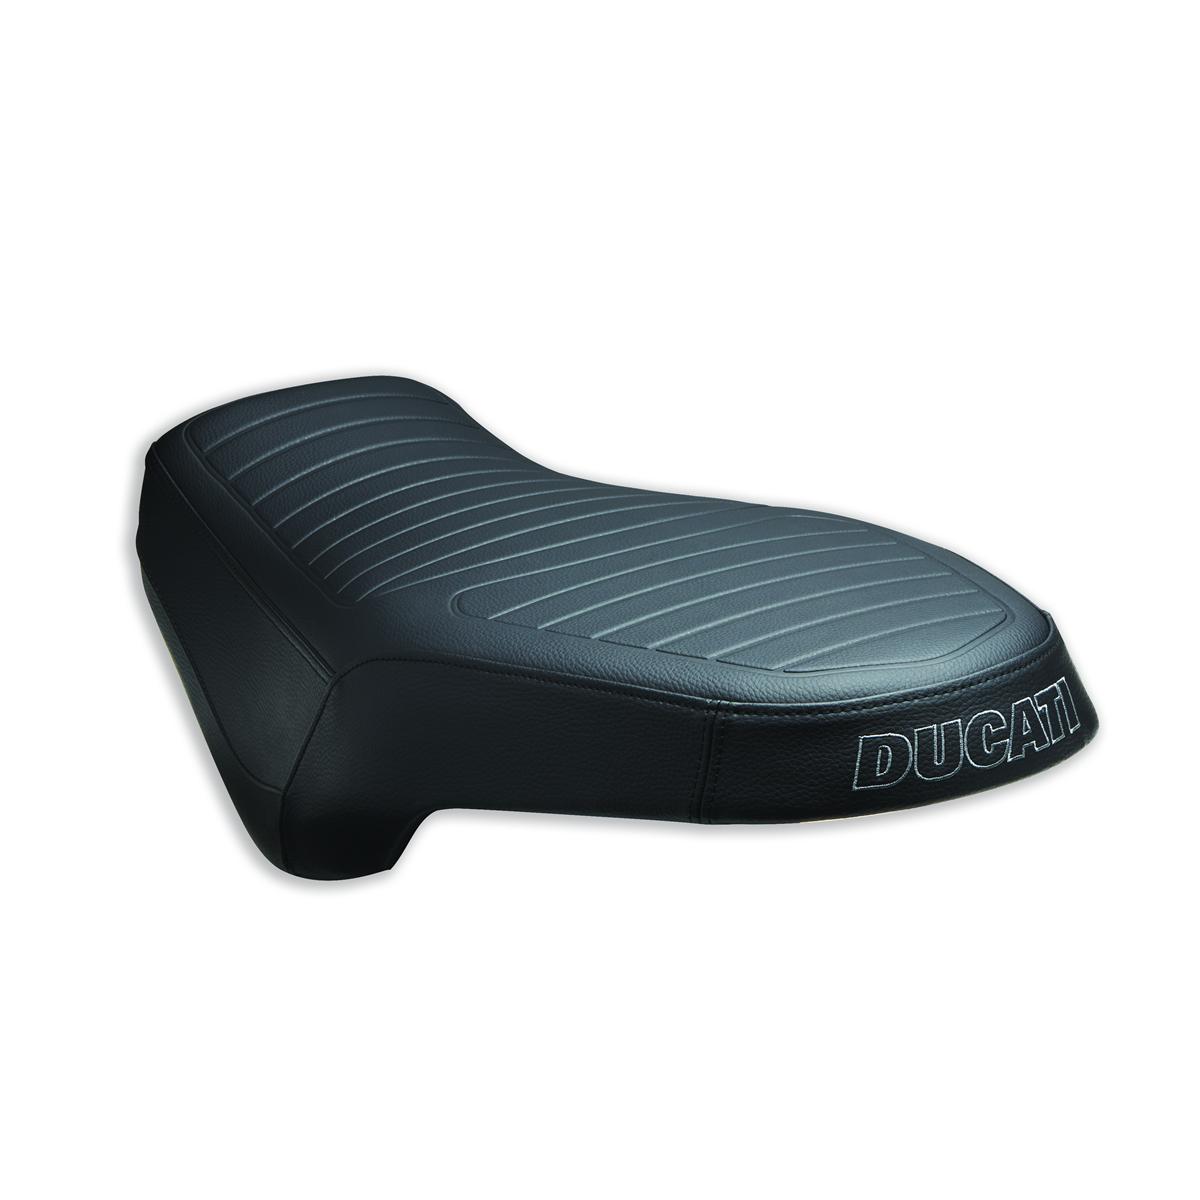 Comfort seat (+ 25 mm).